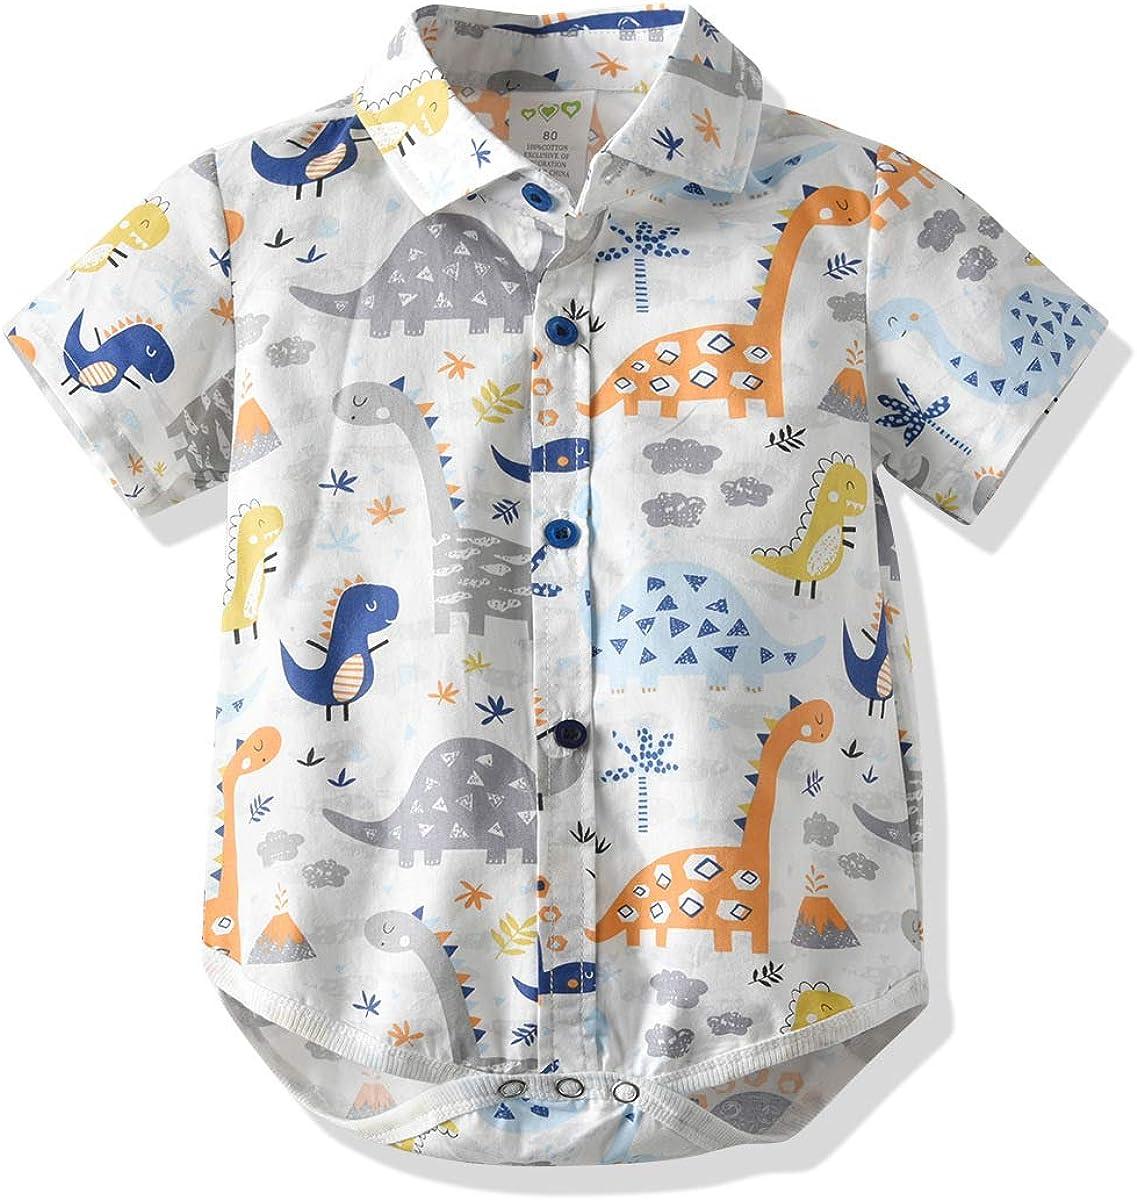 Baby Boys Formal Short Sleeve Shirt Infant Button Up Bodysuit Newborn Romper Clothes Animals Print Toddler